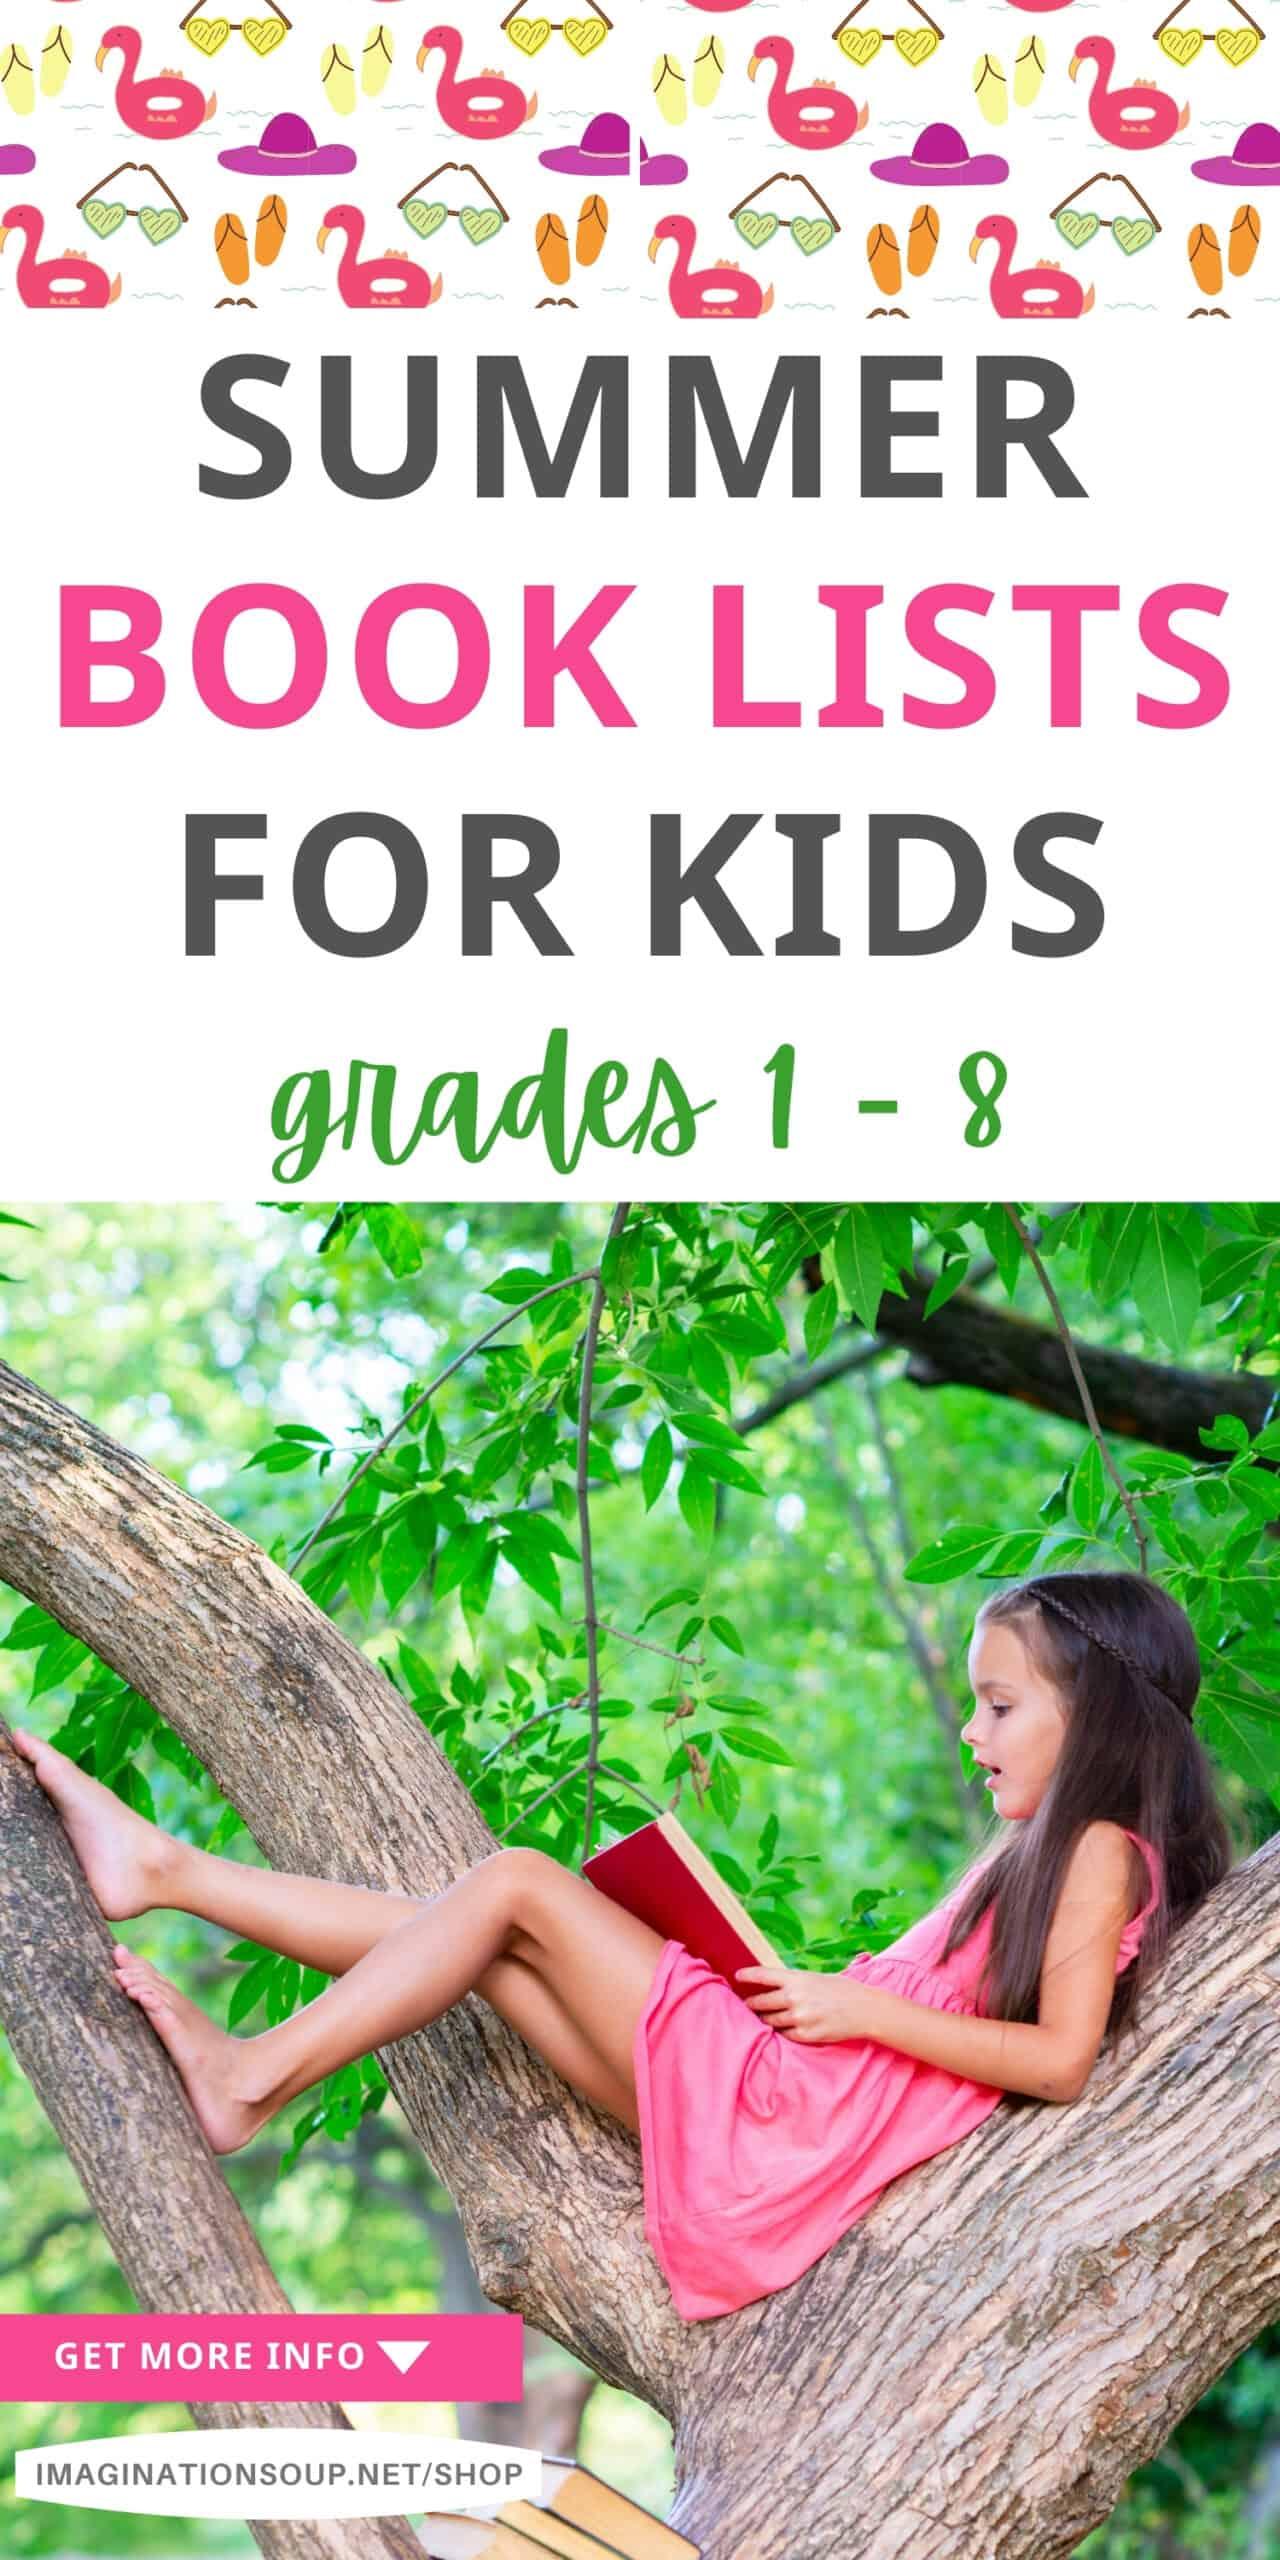 Summer Reading Lists for Kids (Grades 1 - 8)